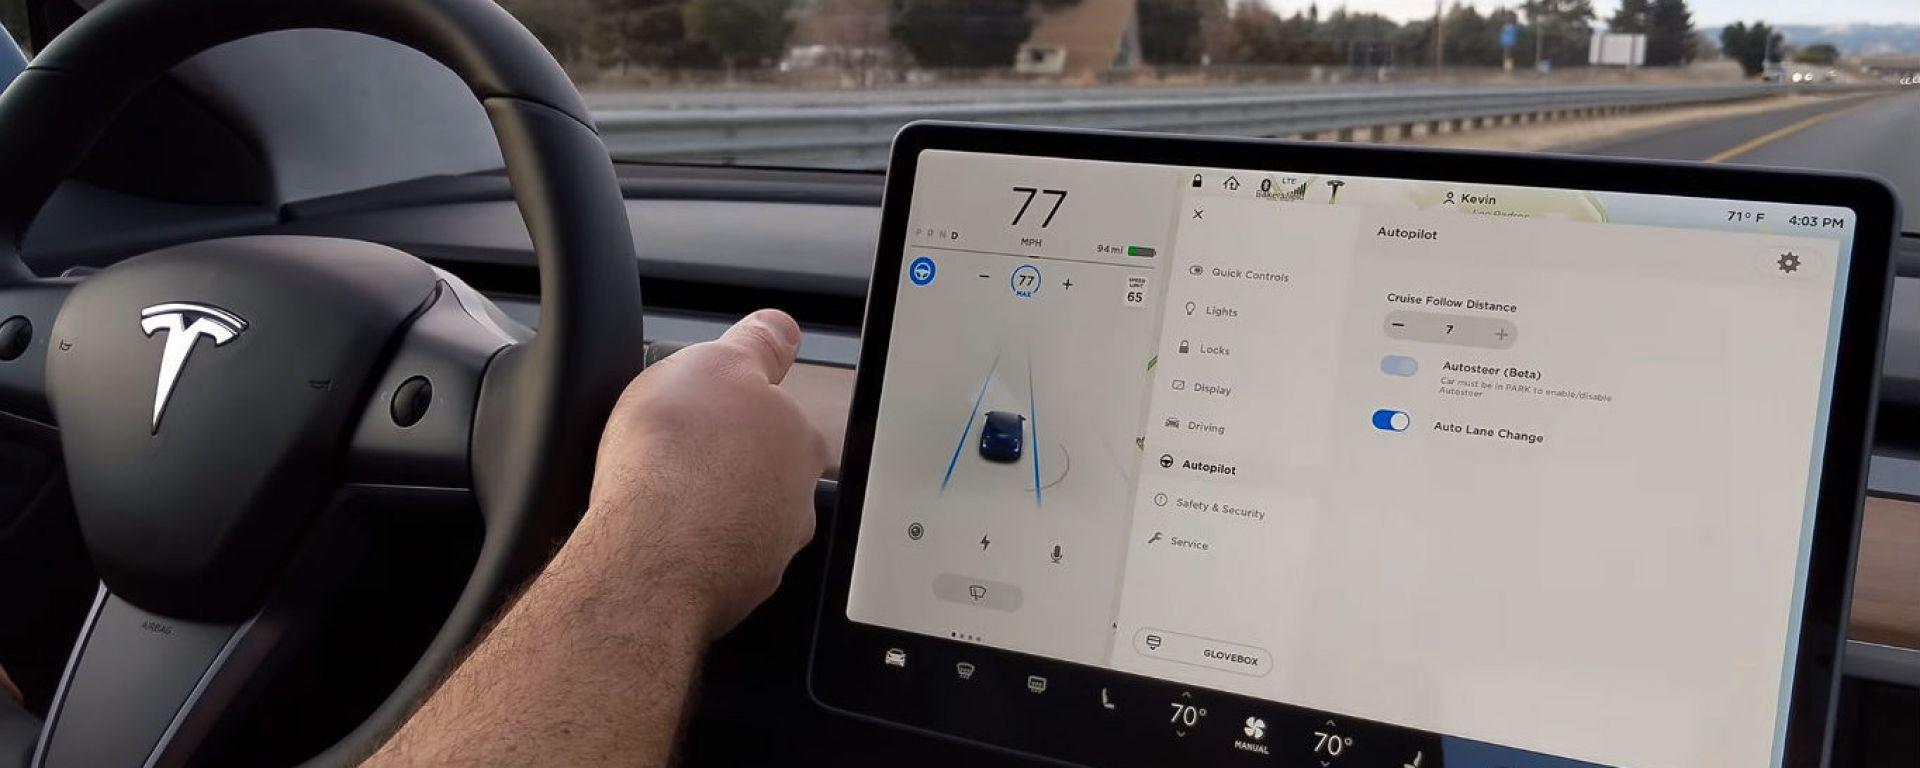 Tesla Model 3, Autopilot anche in Europa, ma in ritardo